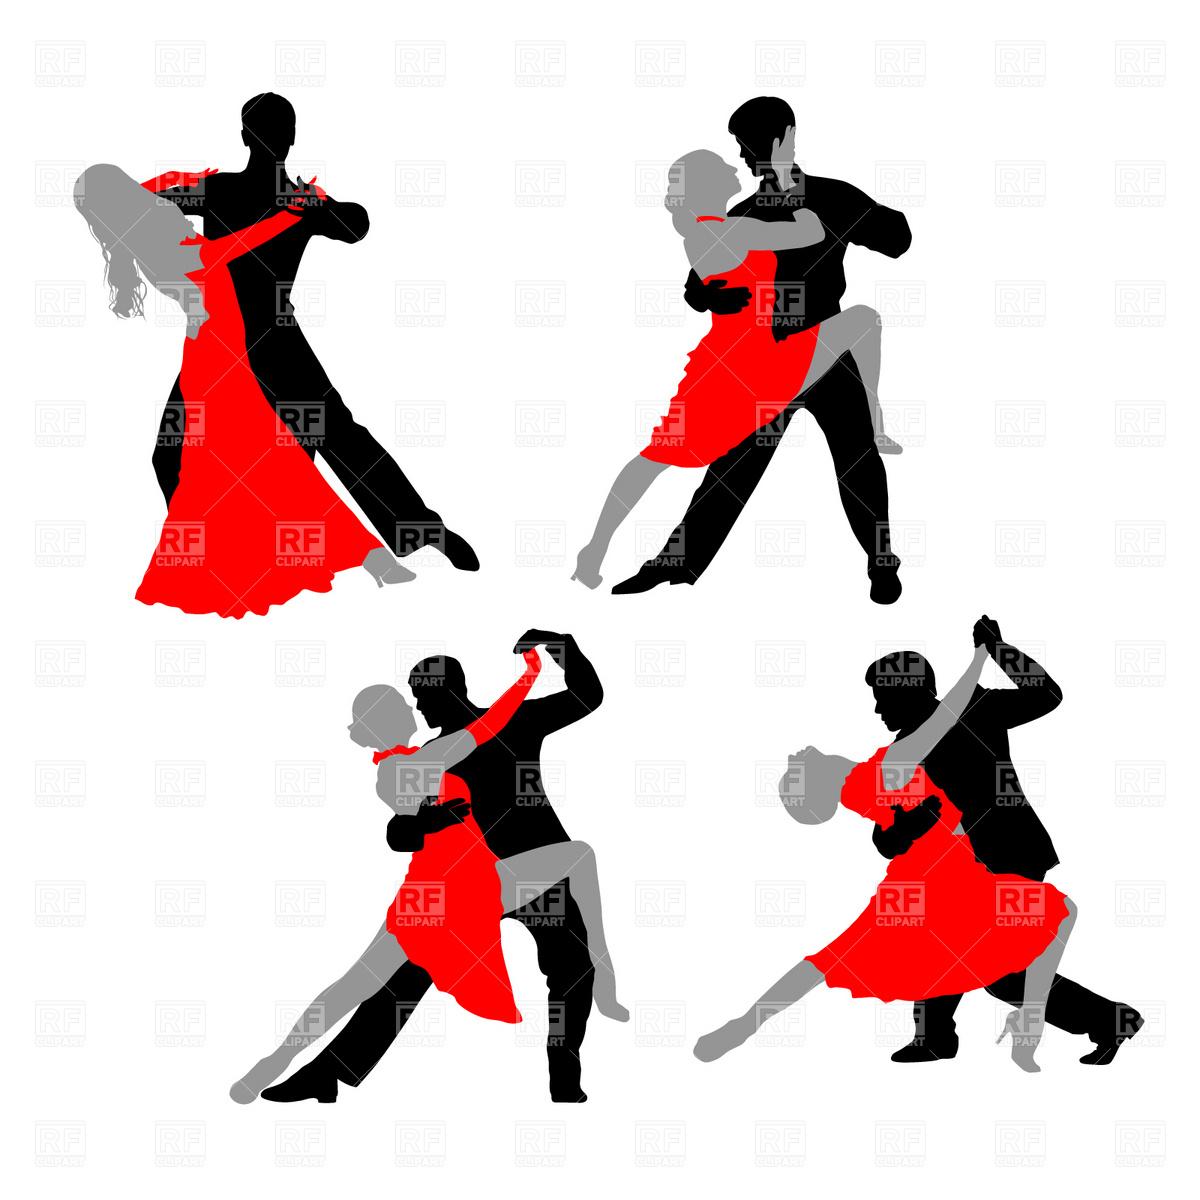 Danse clipart salsa dancing Dance Eps Images Photography Tango